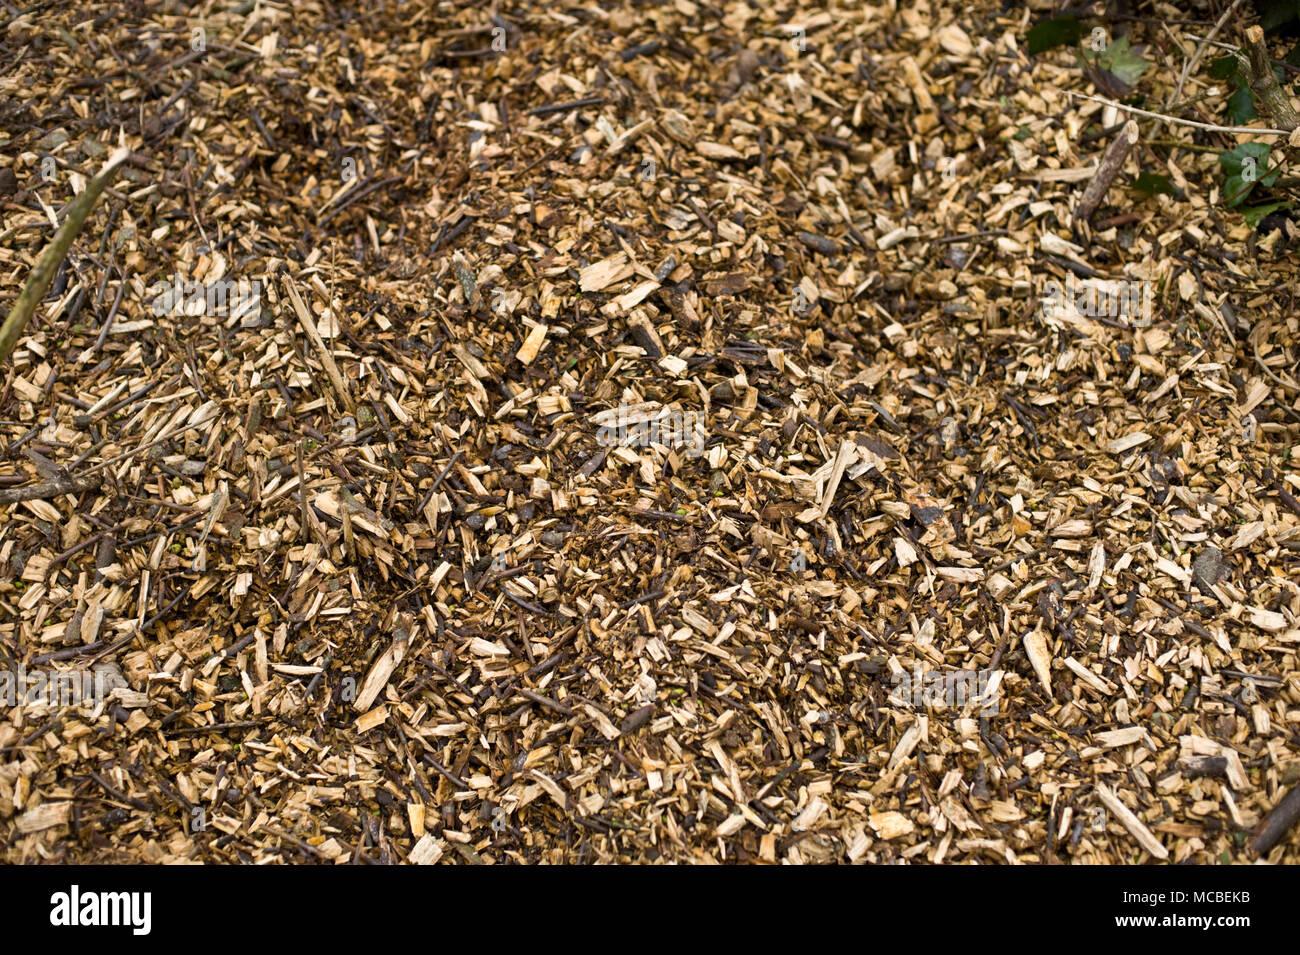 Abgebrochene Bäume nach dem Fällen arbeiten in Hay-on-Wye Powys Wales UK Stockbild